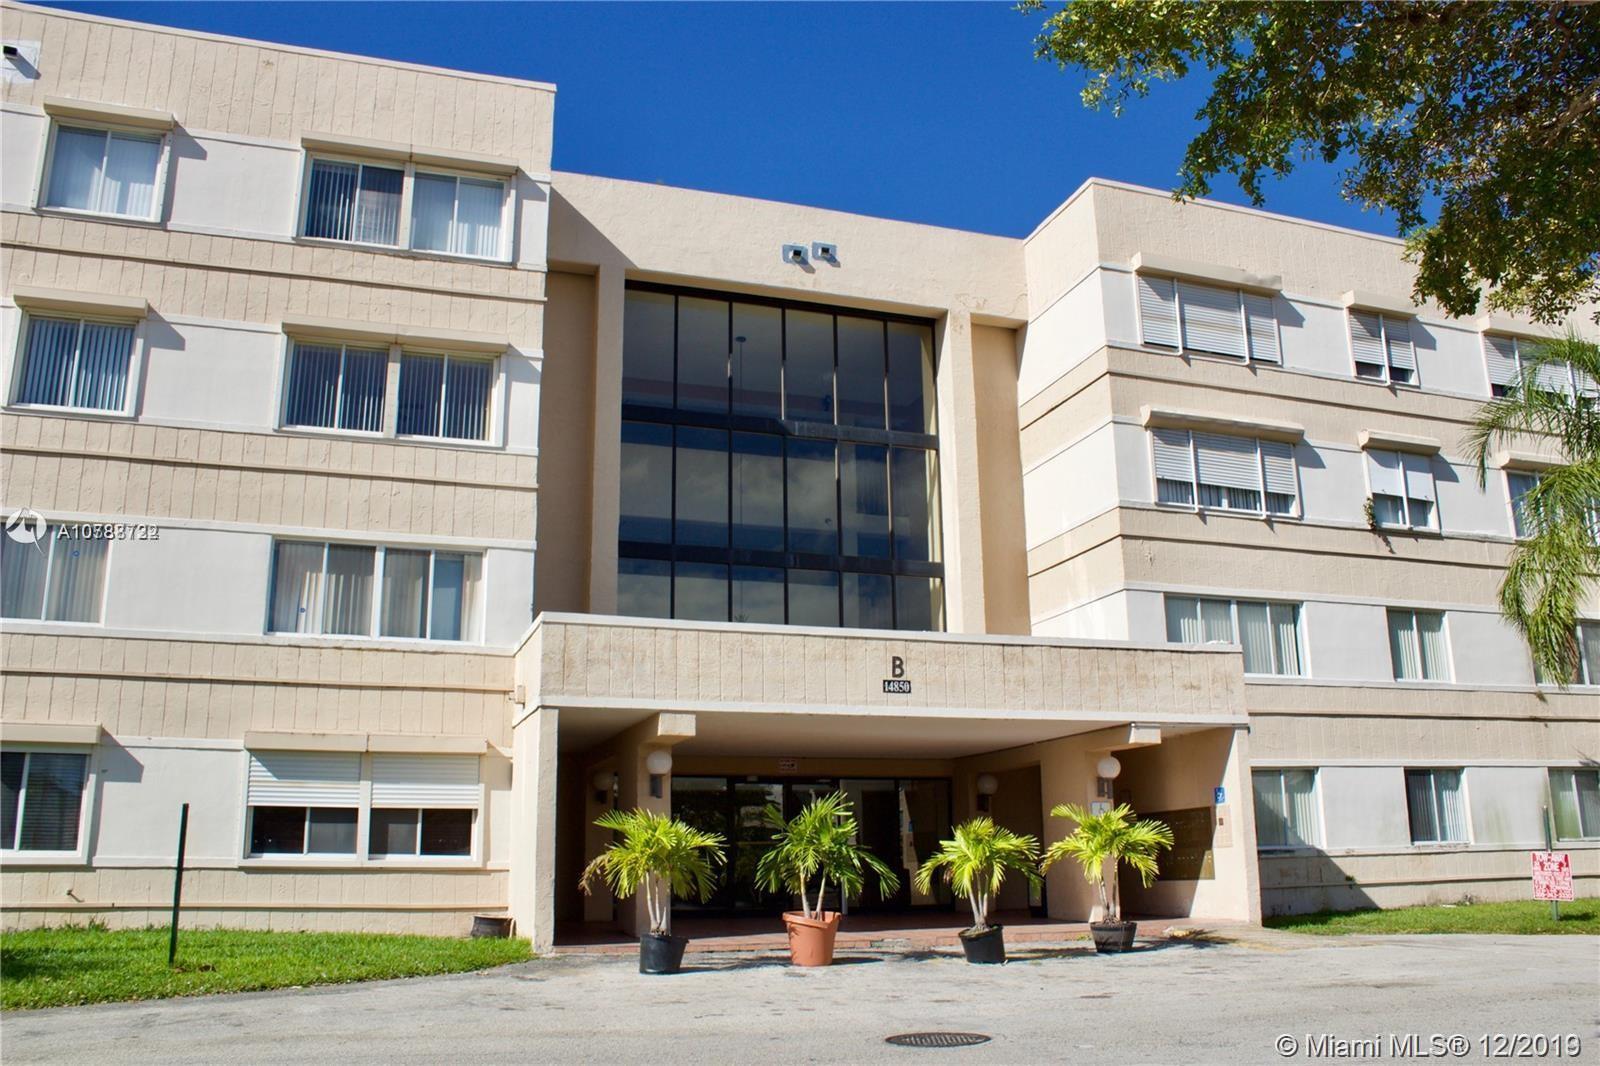 14850 Naranja Lakes Blvd #B3A, Homestead, FL 33032 - Homestead, FL real estate listing